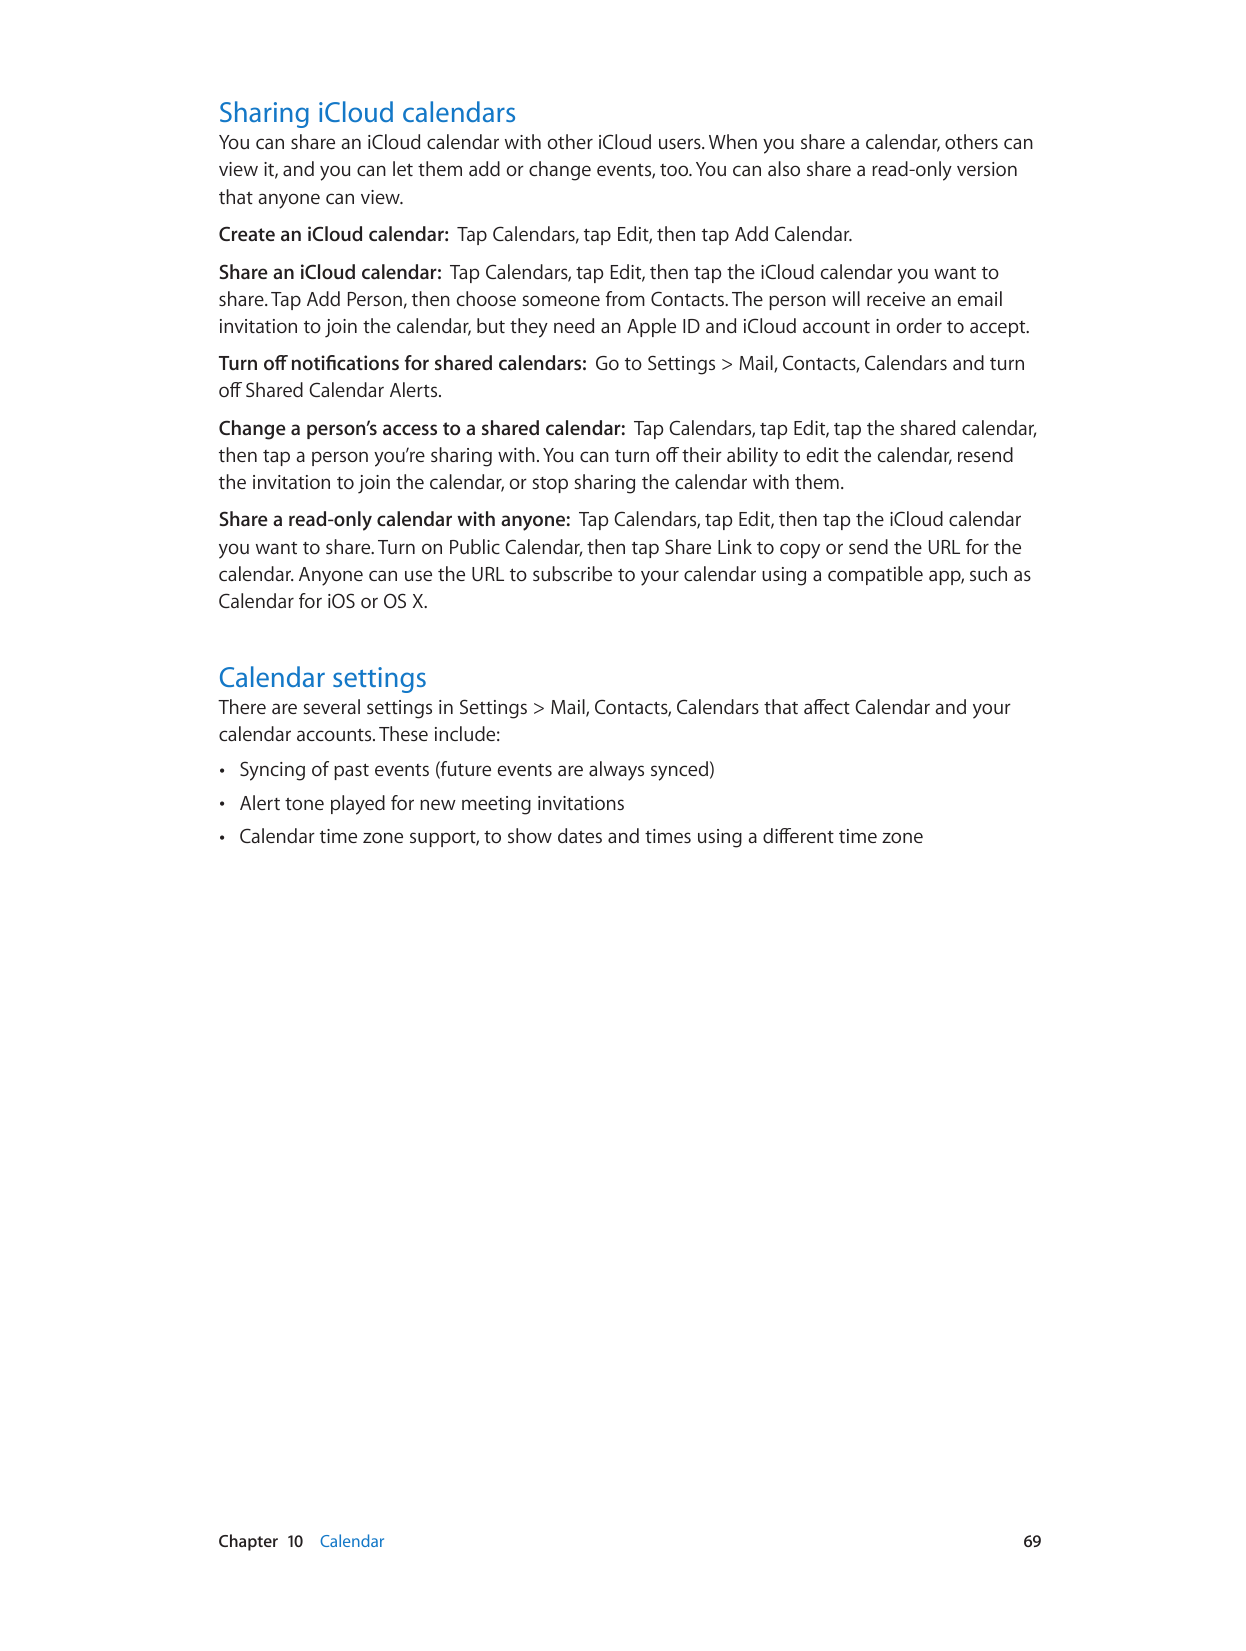 Manual - Apple iOS - iOS 6 - Smart Guides